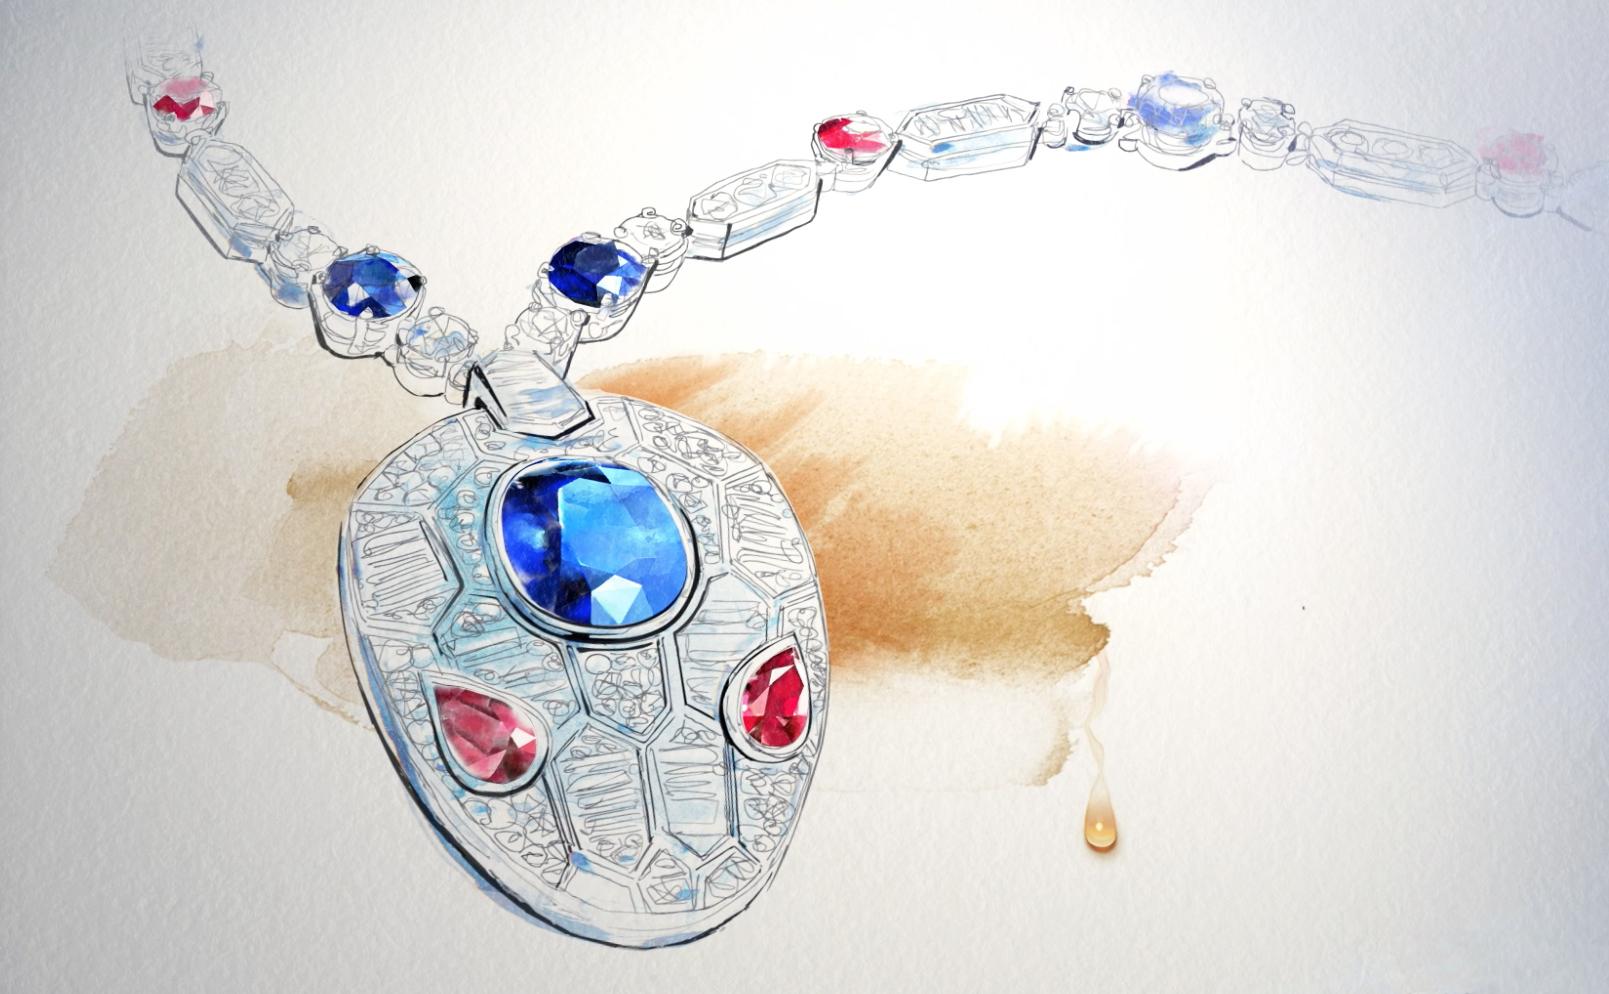 Watercolor illustration, fashion, jewelry